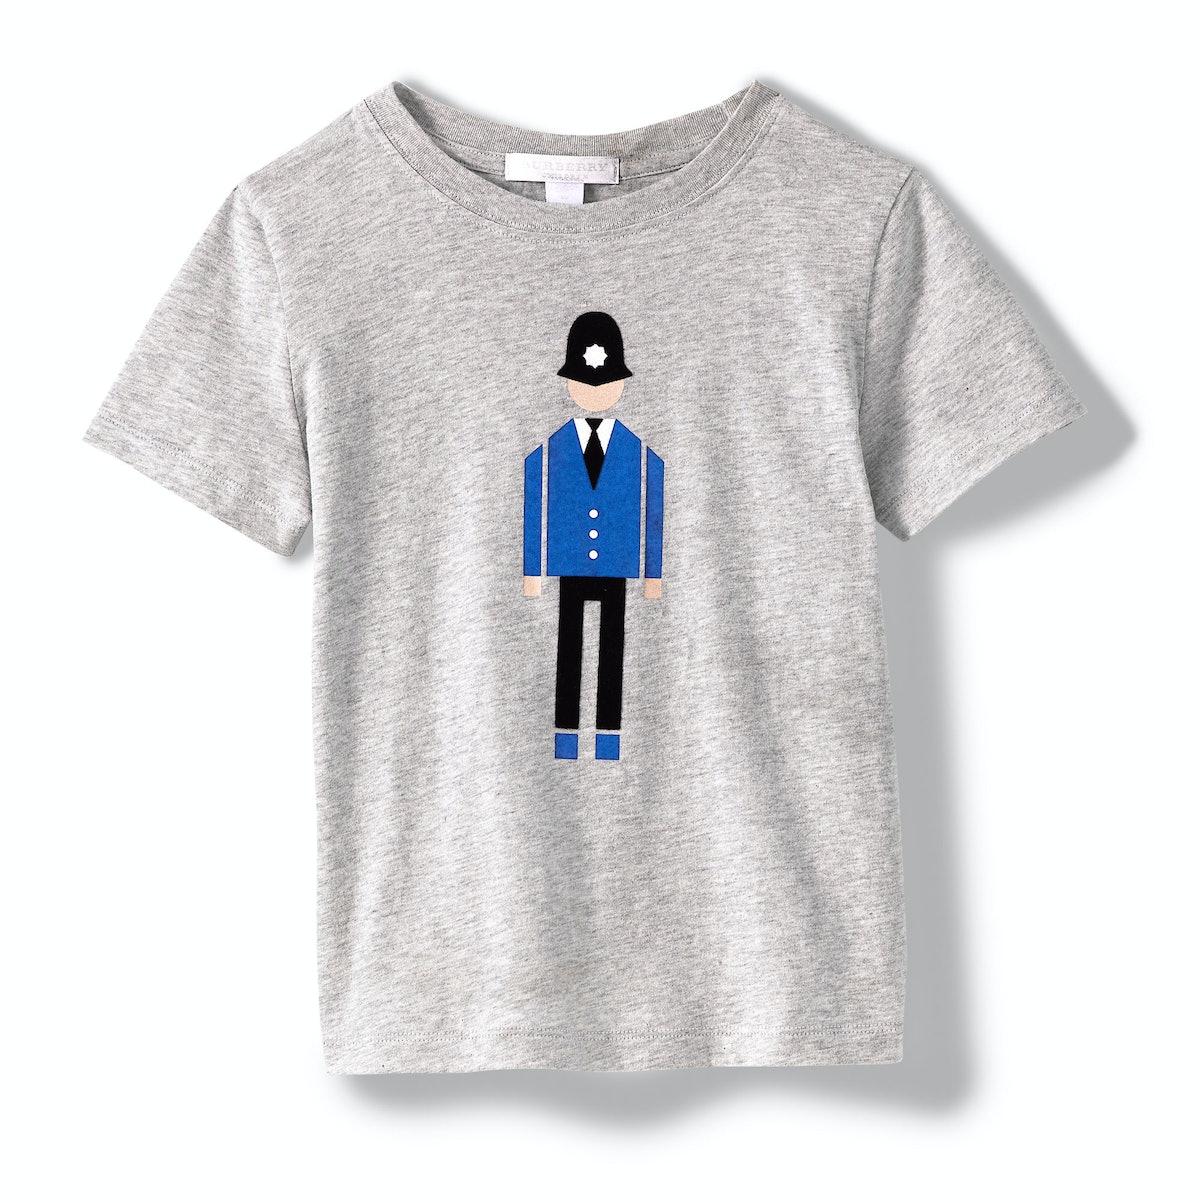 Burberry T-shirt, $85, [saks.com](http://rstyle.me/n/dzak63w3n).